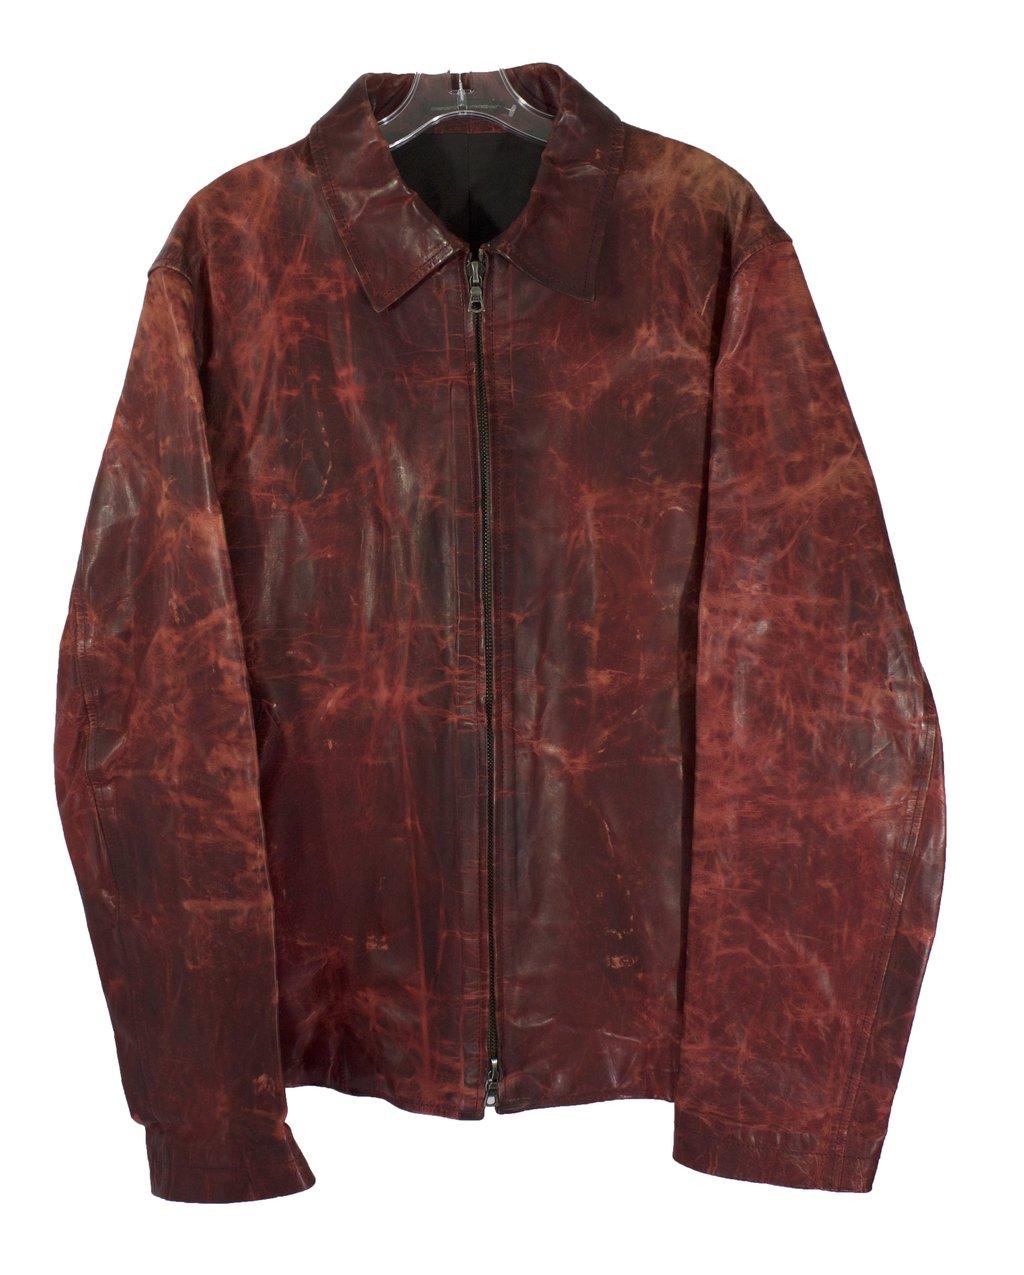 Toni Sailer Men's Oscar Jacket